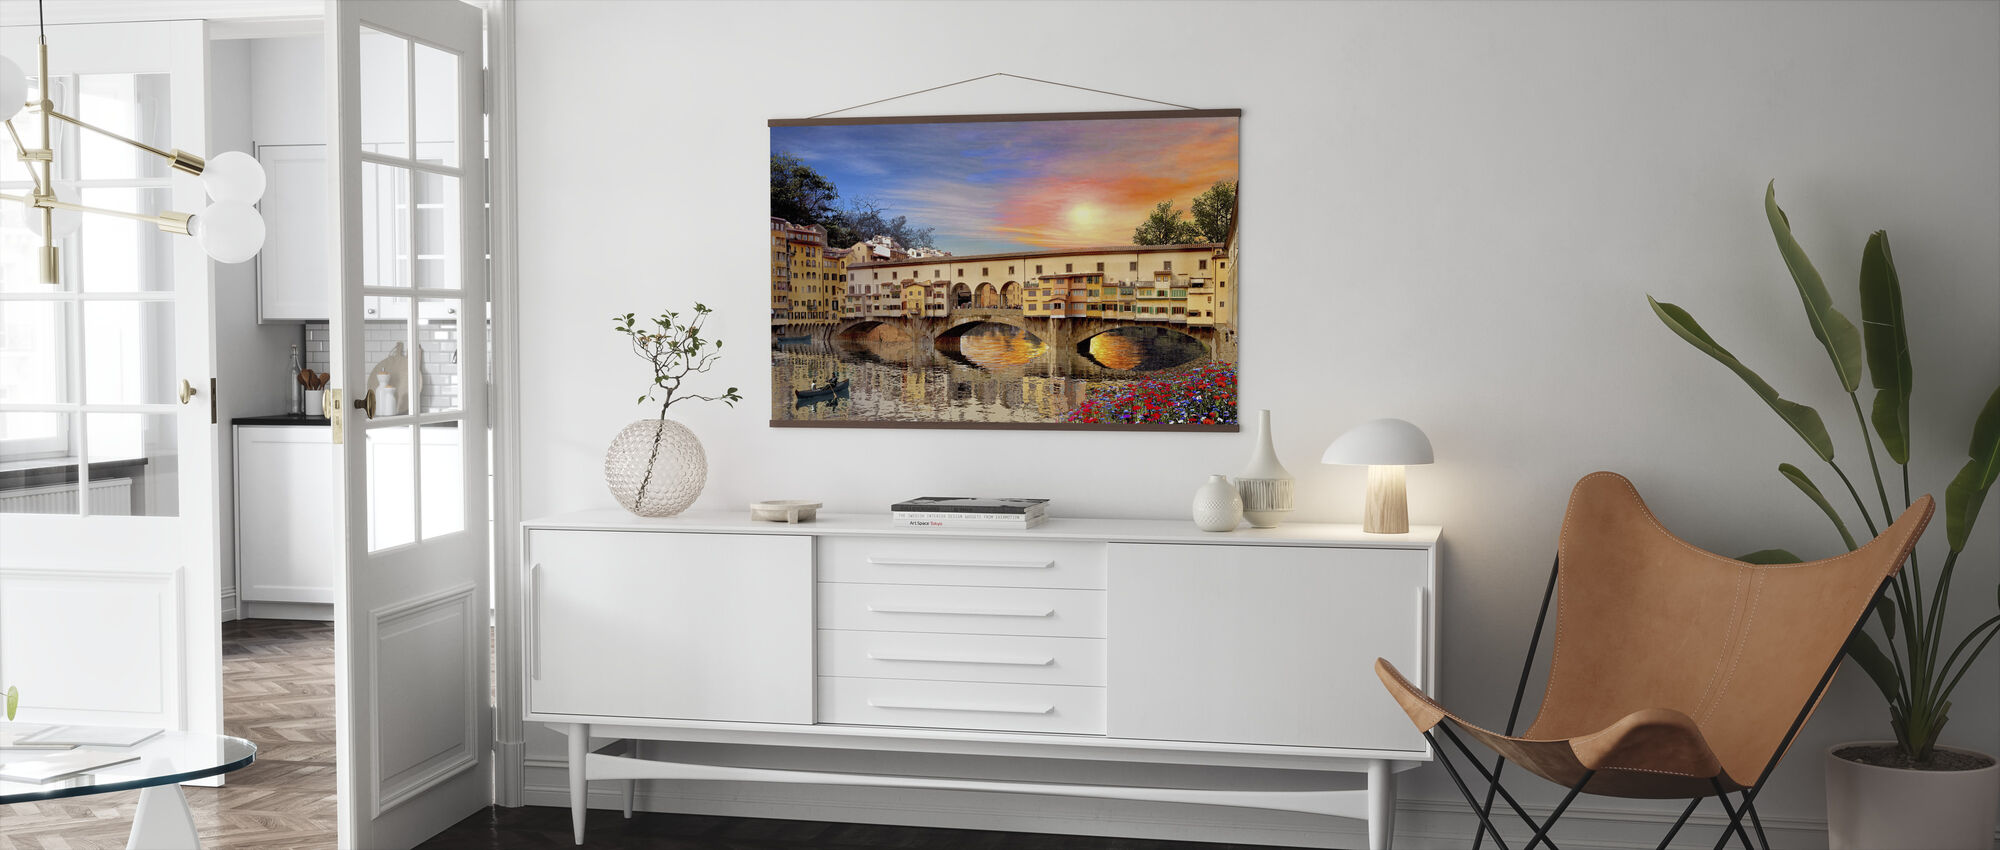 Florene-broen - Plakat - Stue